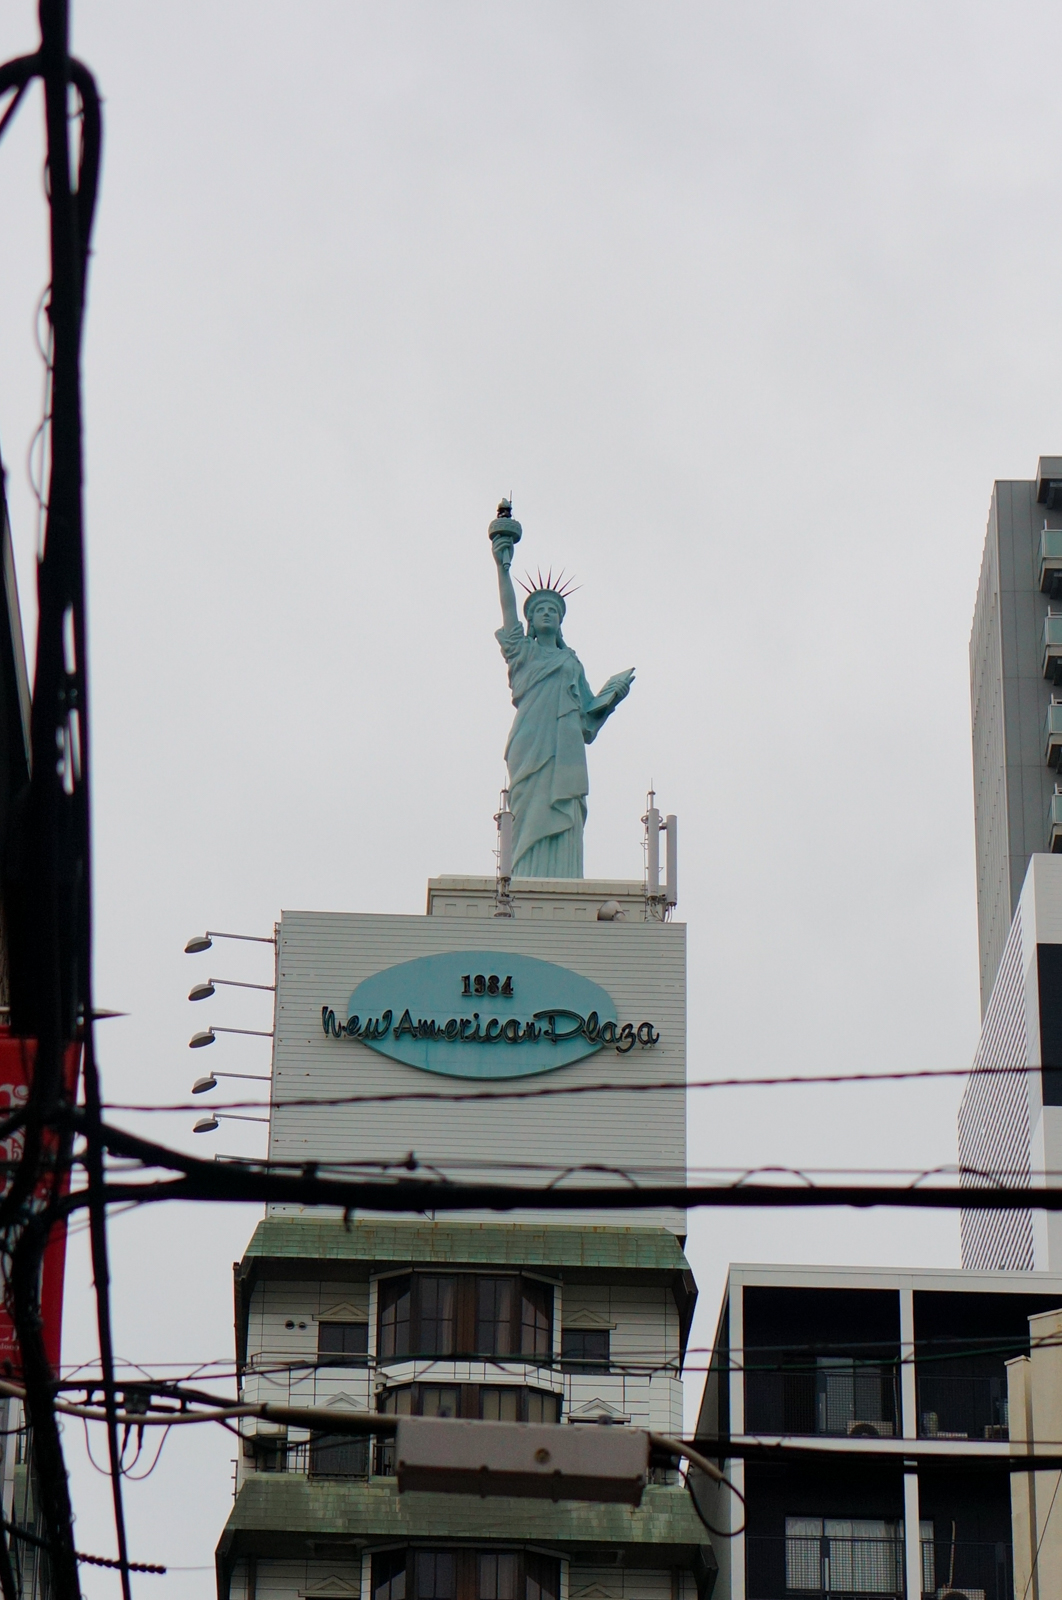 osaka, voyage japon, visiter osaka, osaka authentique, osaka america mura, village américain osaka, america mura, statue liberté osaka